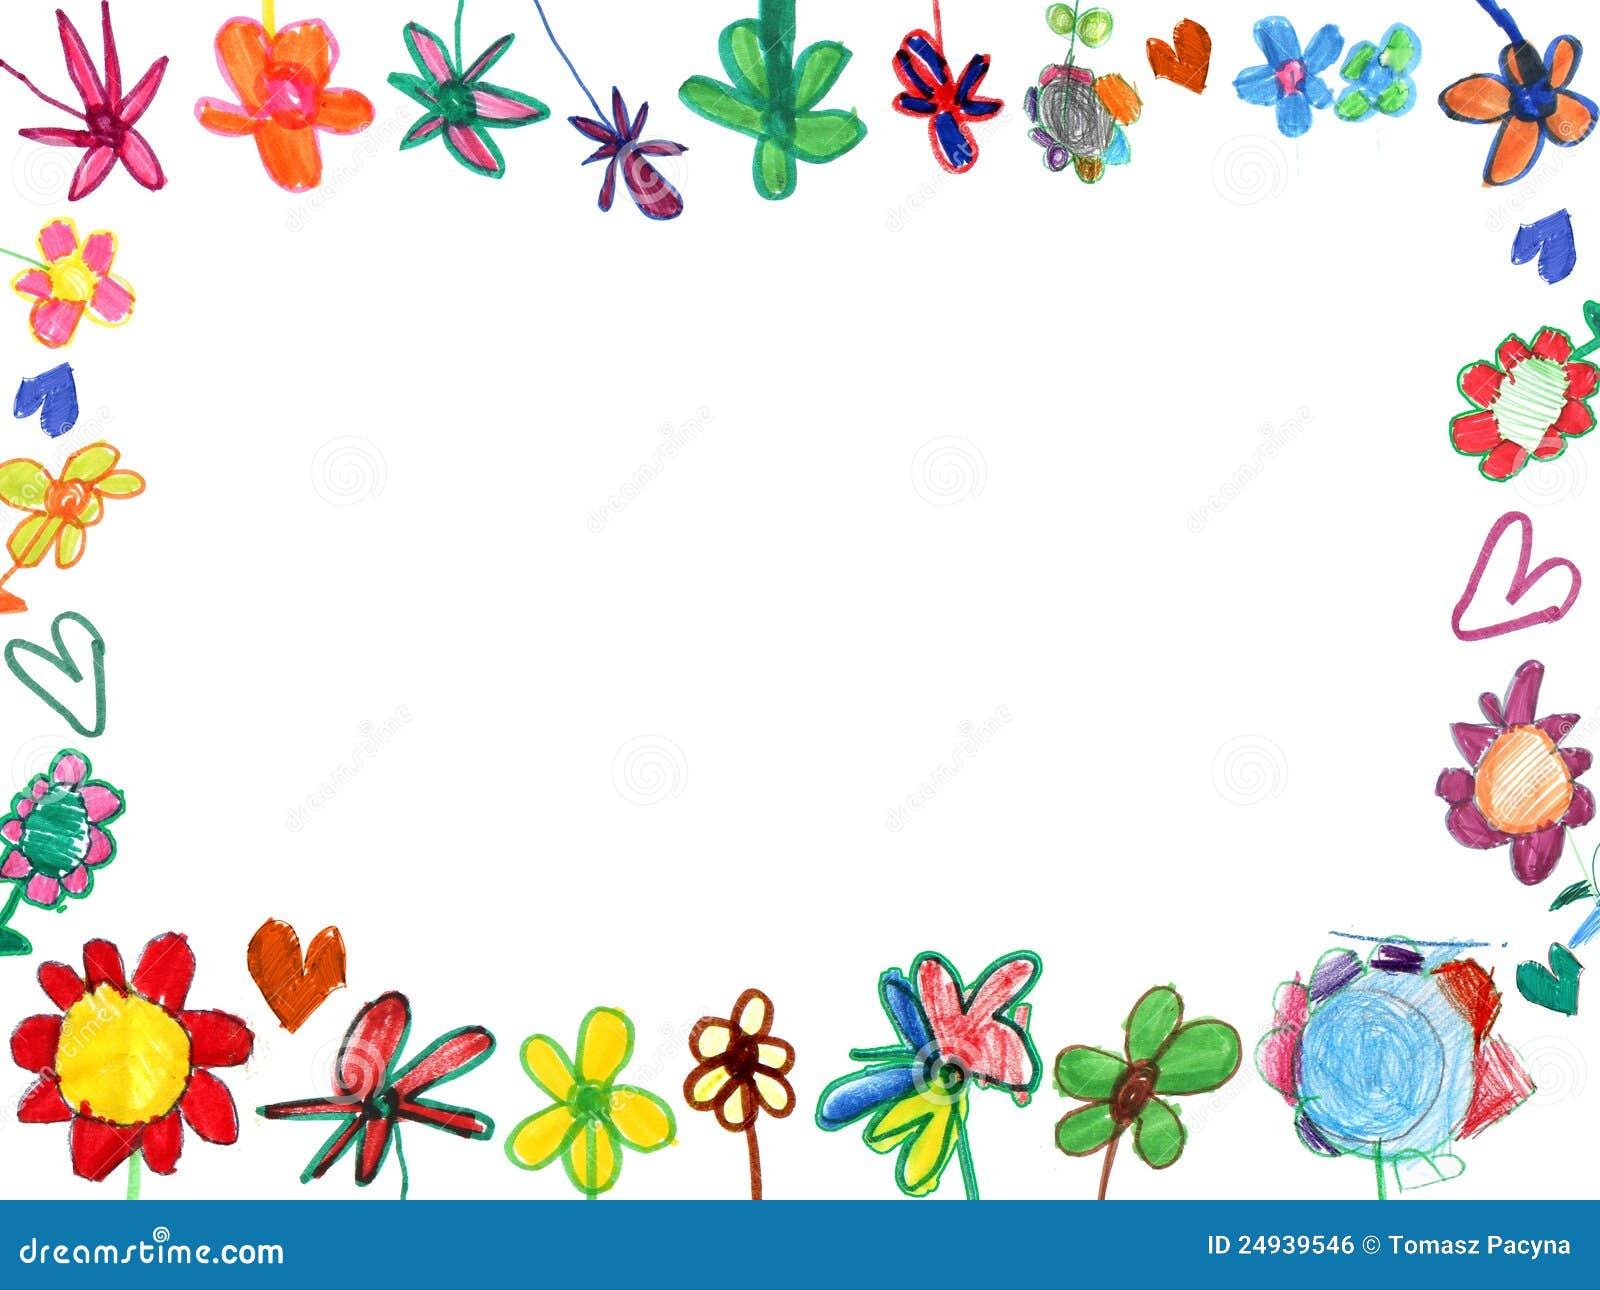 Horizontal flowers frame, child illustration